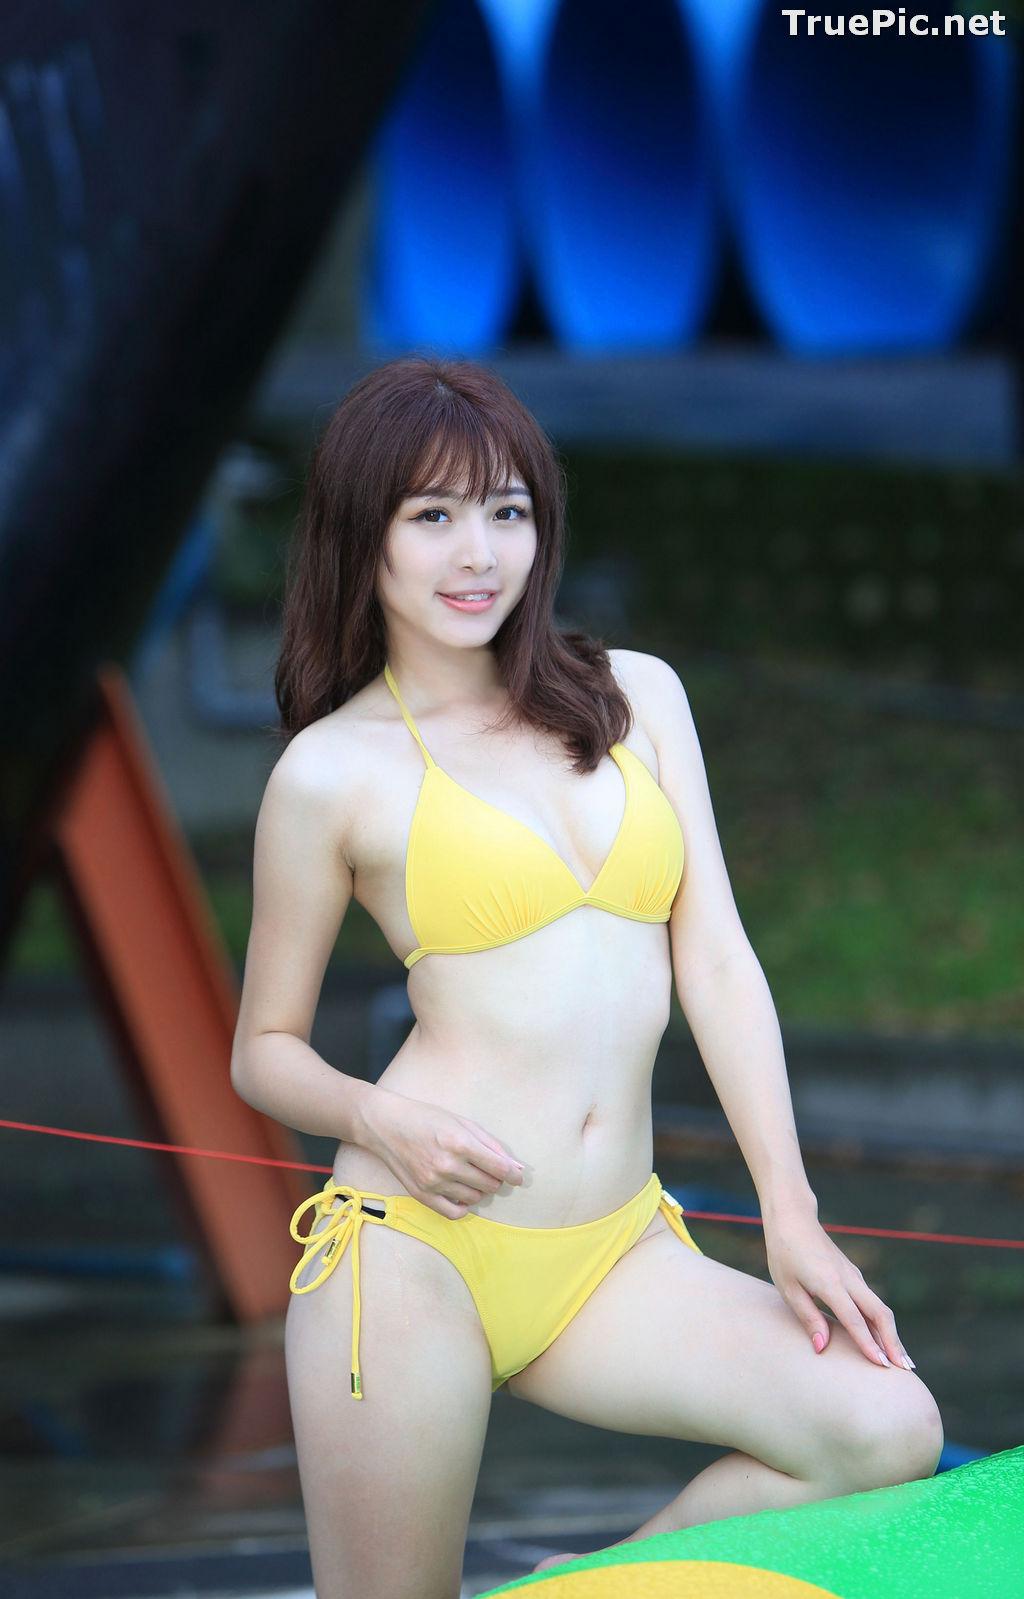 Image Taiwanese Model - Ash Ley - Yellow Bikini at Taipei Water Museum - TruePic.net - Picture-29